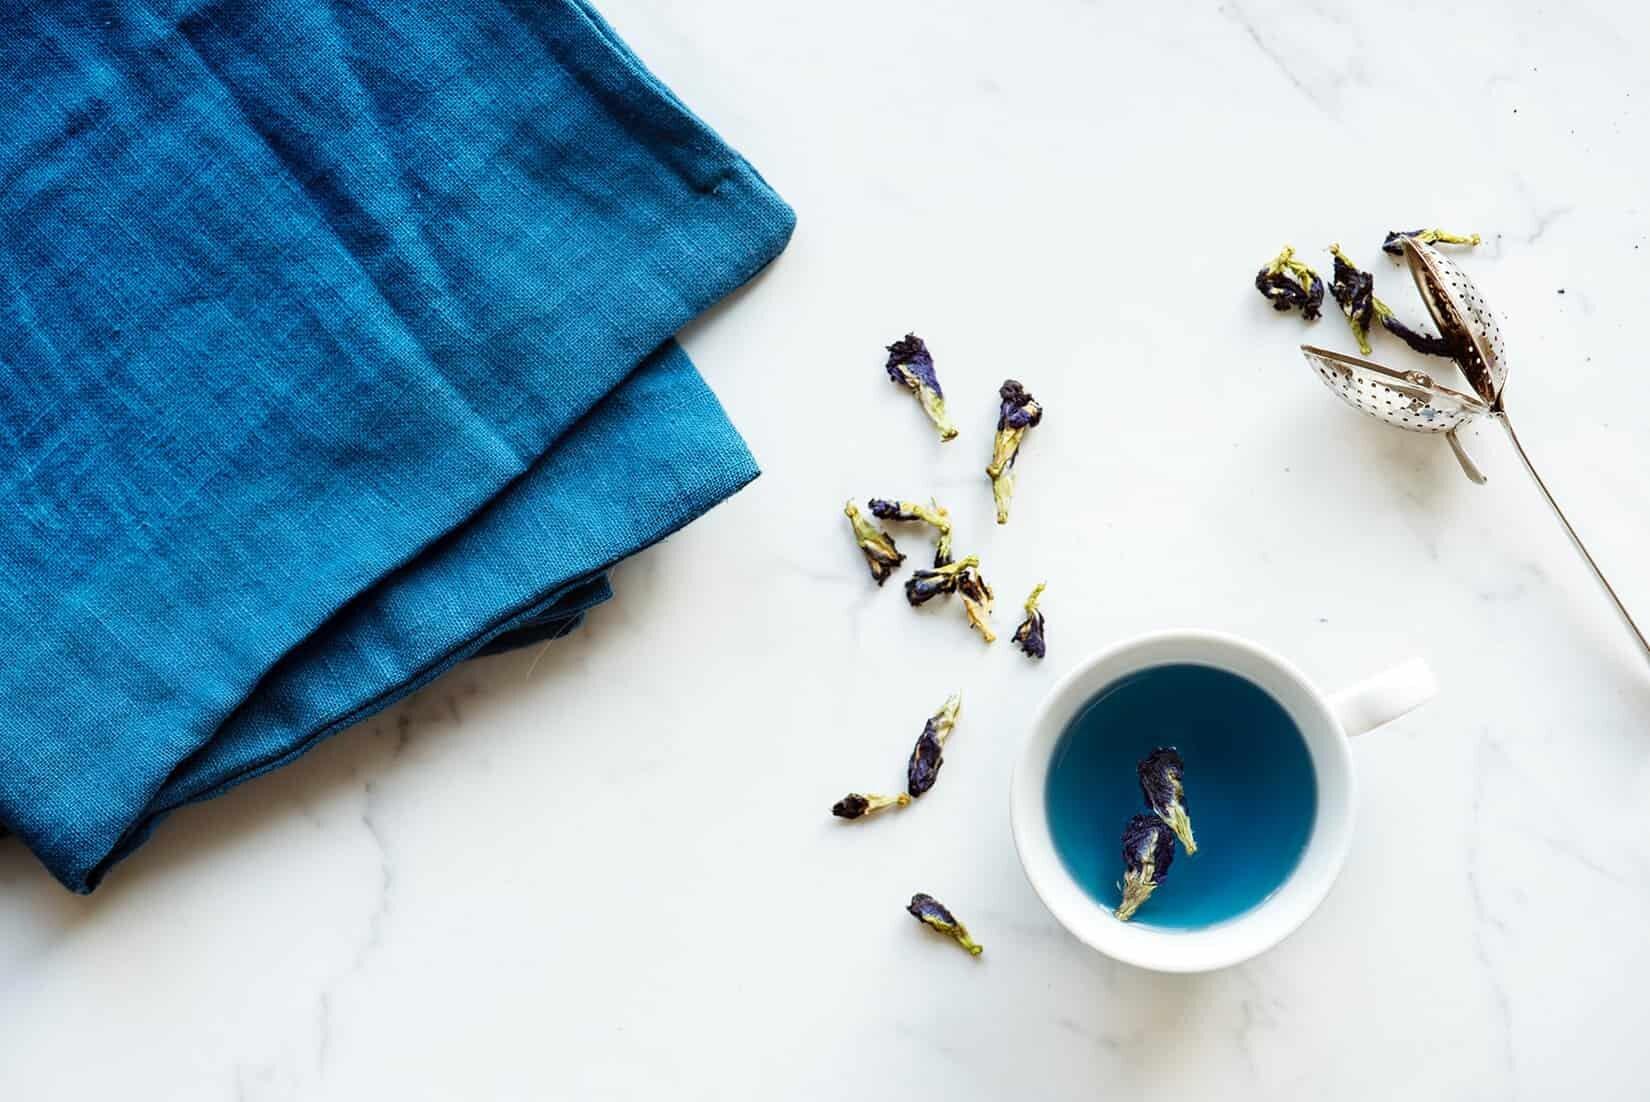 fruity green tea on a marble table